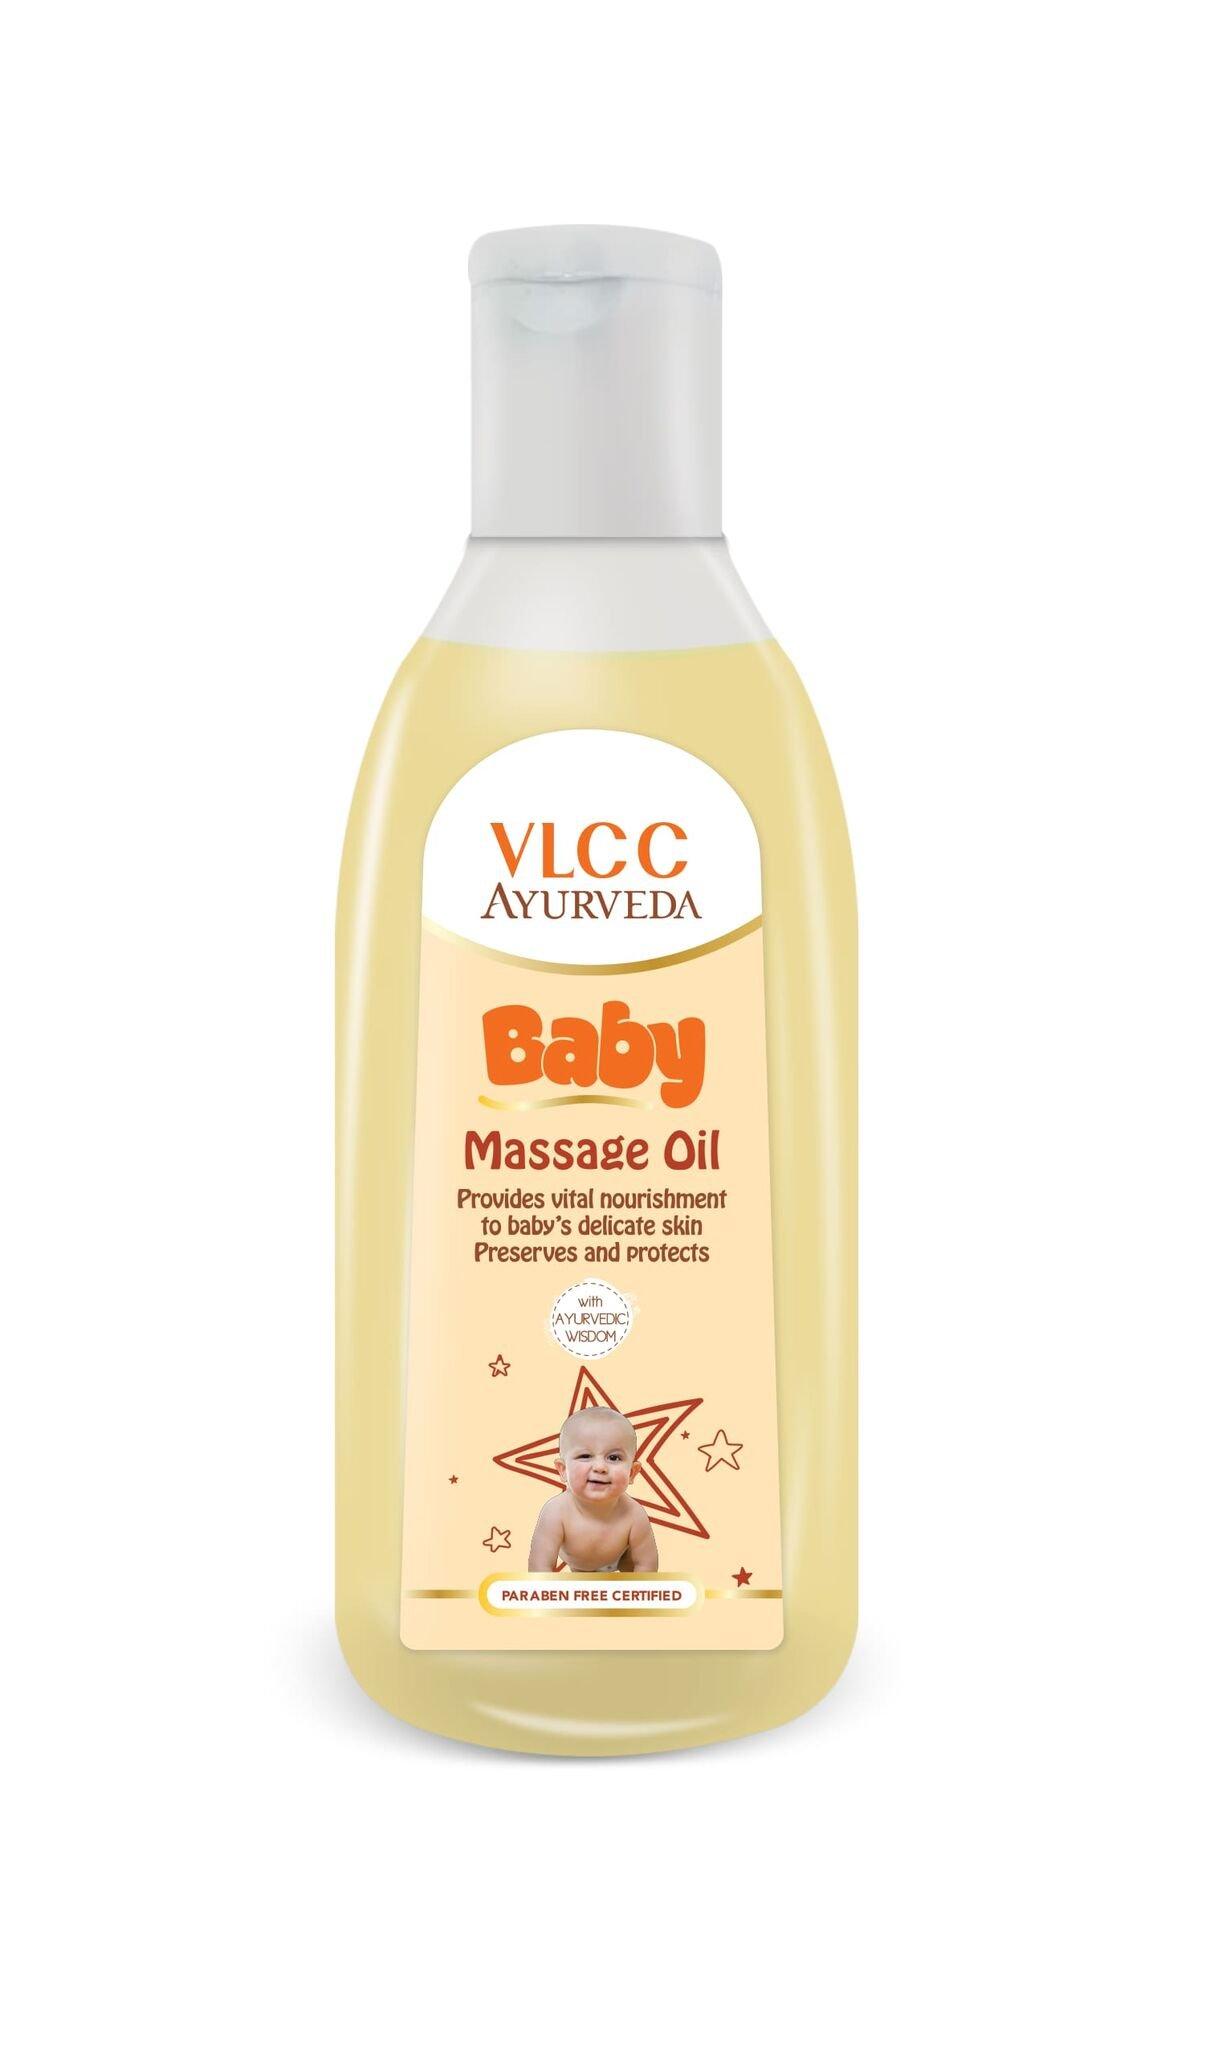 VLCC Ayurveda Baby Massage Oil (100ml) by VLCC